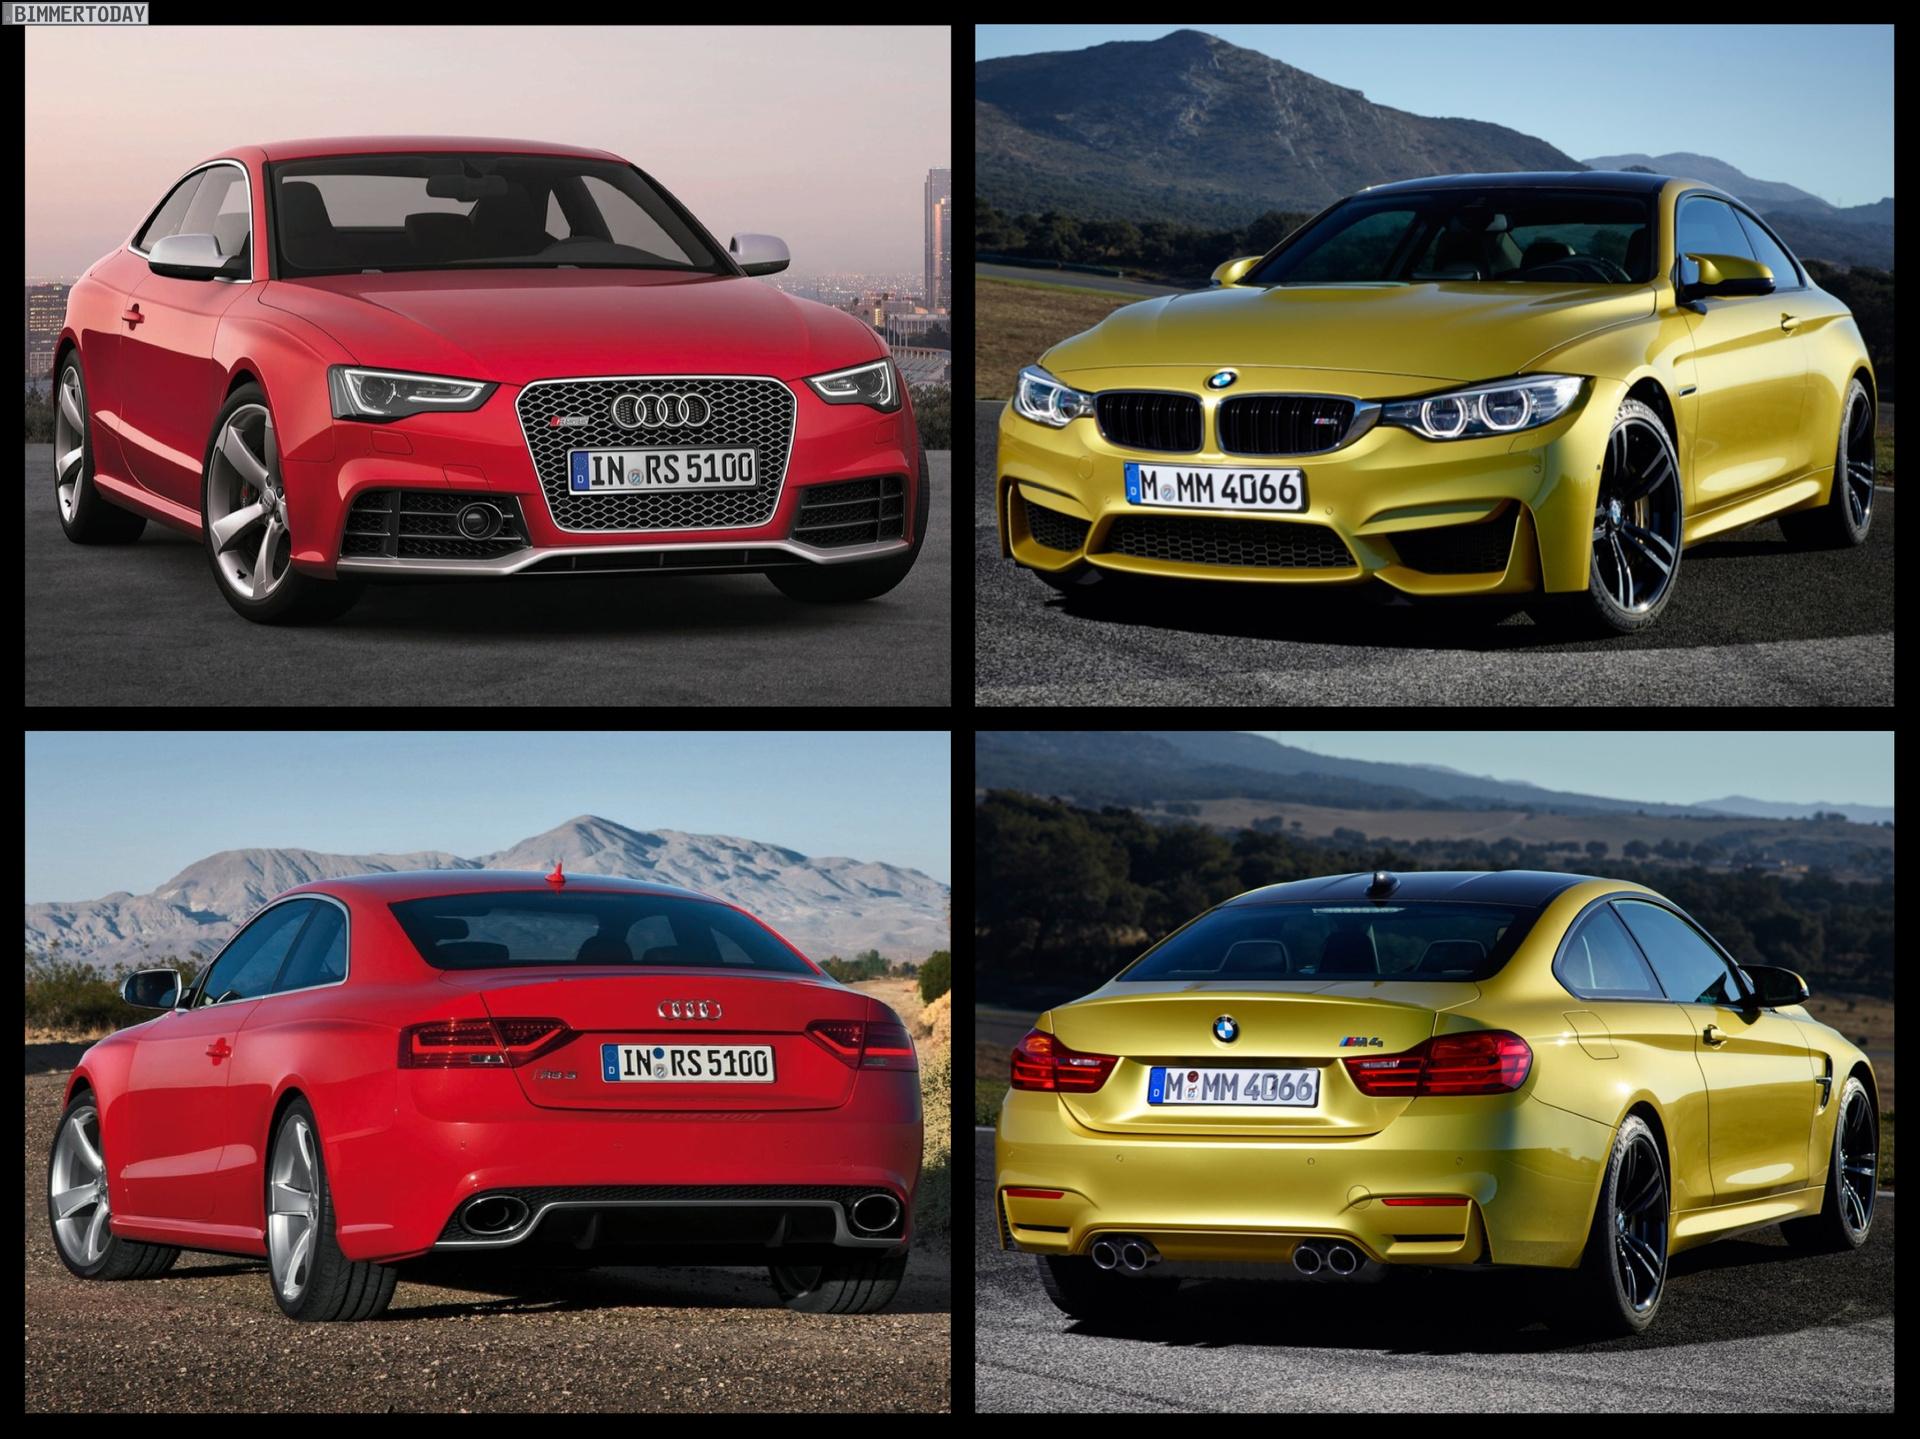 Bild Vergleich BMW M4 F82 Audi RS5 Coupe 05